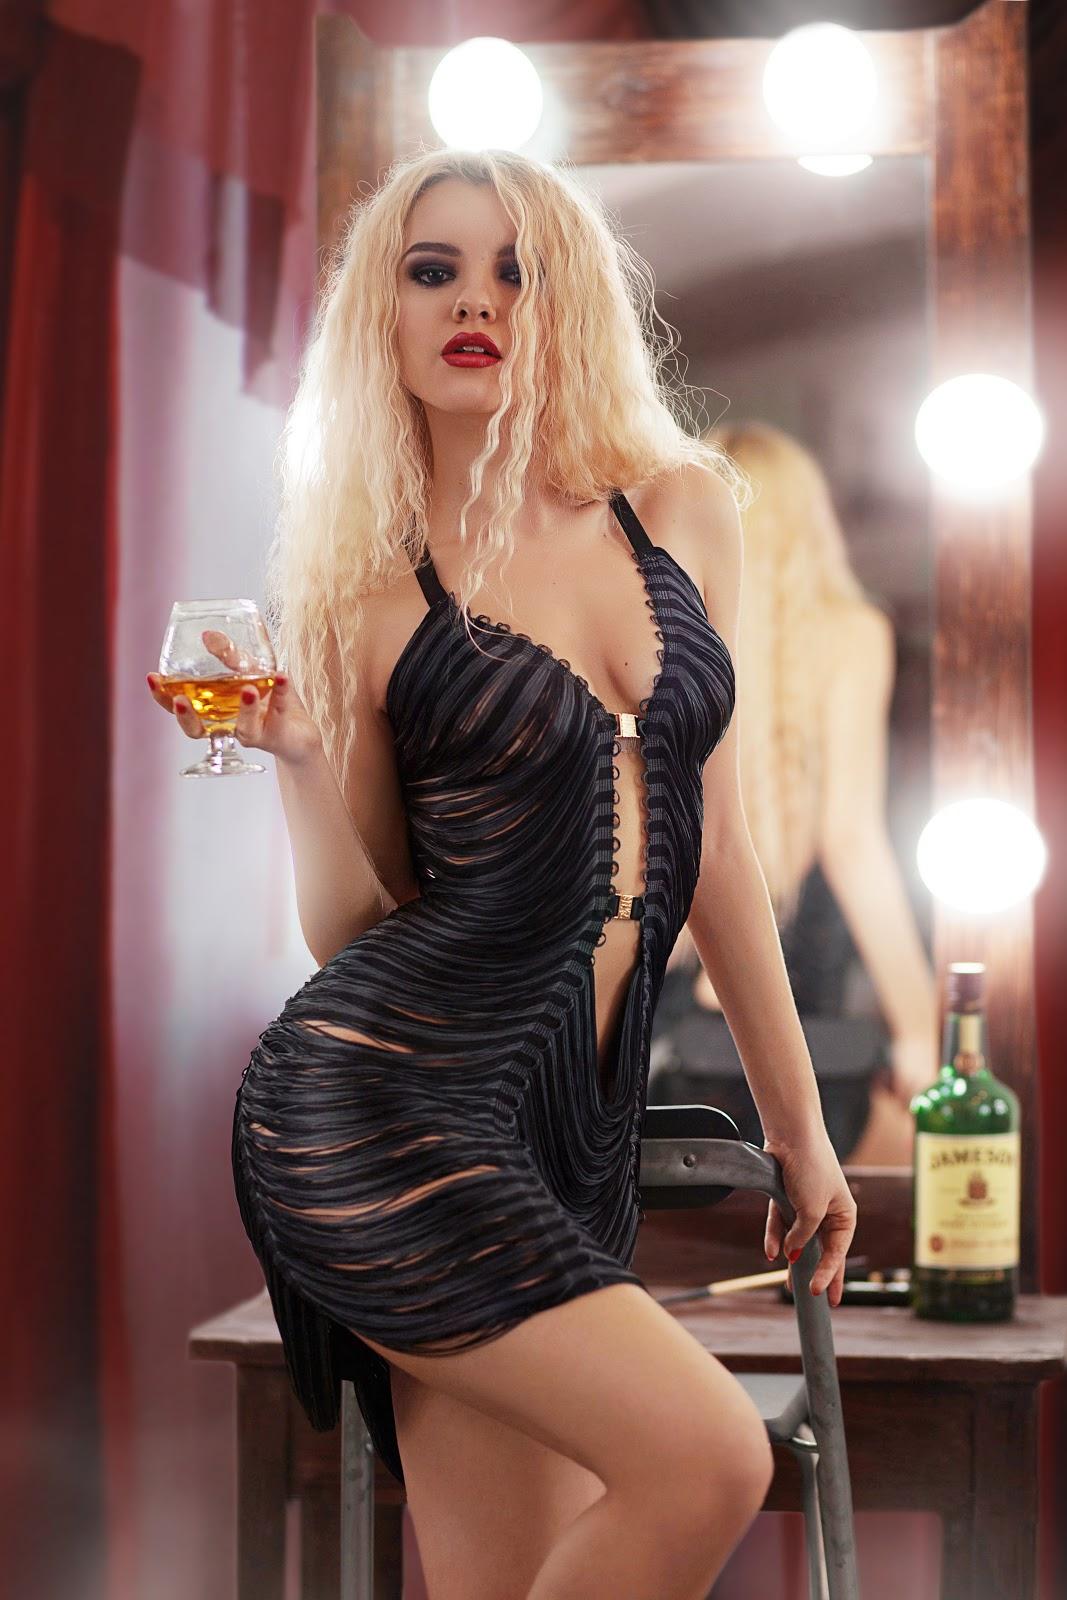 sexy blonde, sexy dress, tiny waist, sexy girls, smoking girl